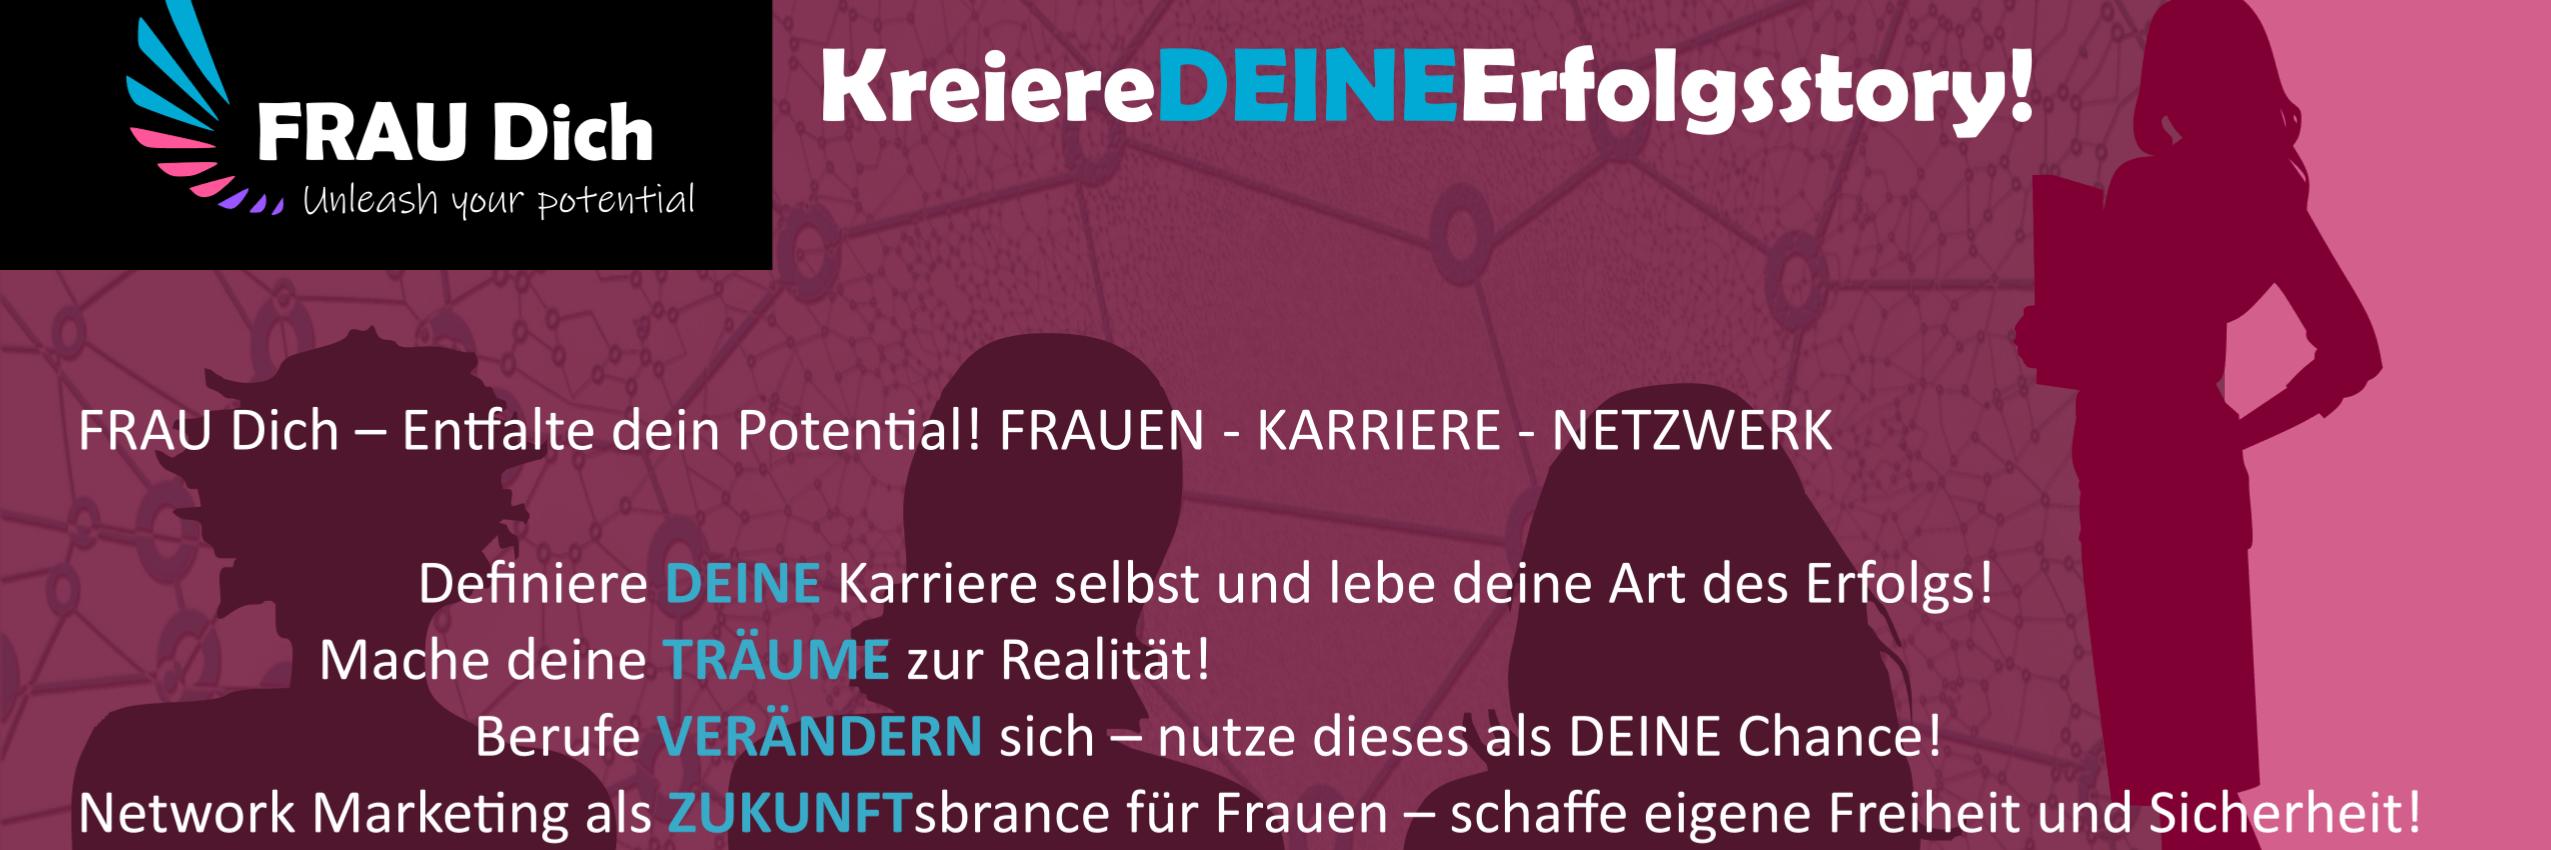 Frau Dich - Kreiere DEINE Erfolgsstory